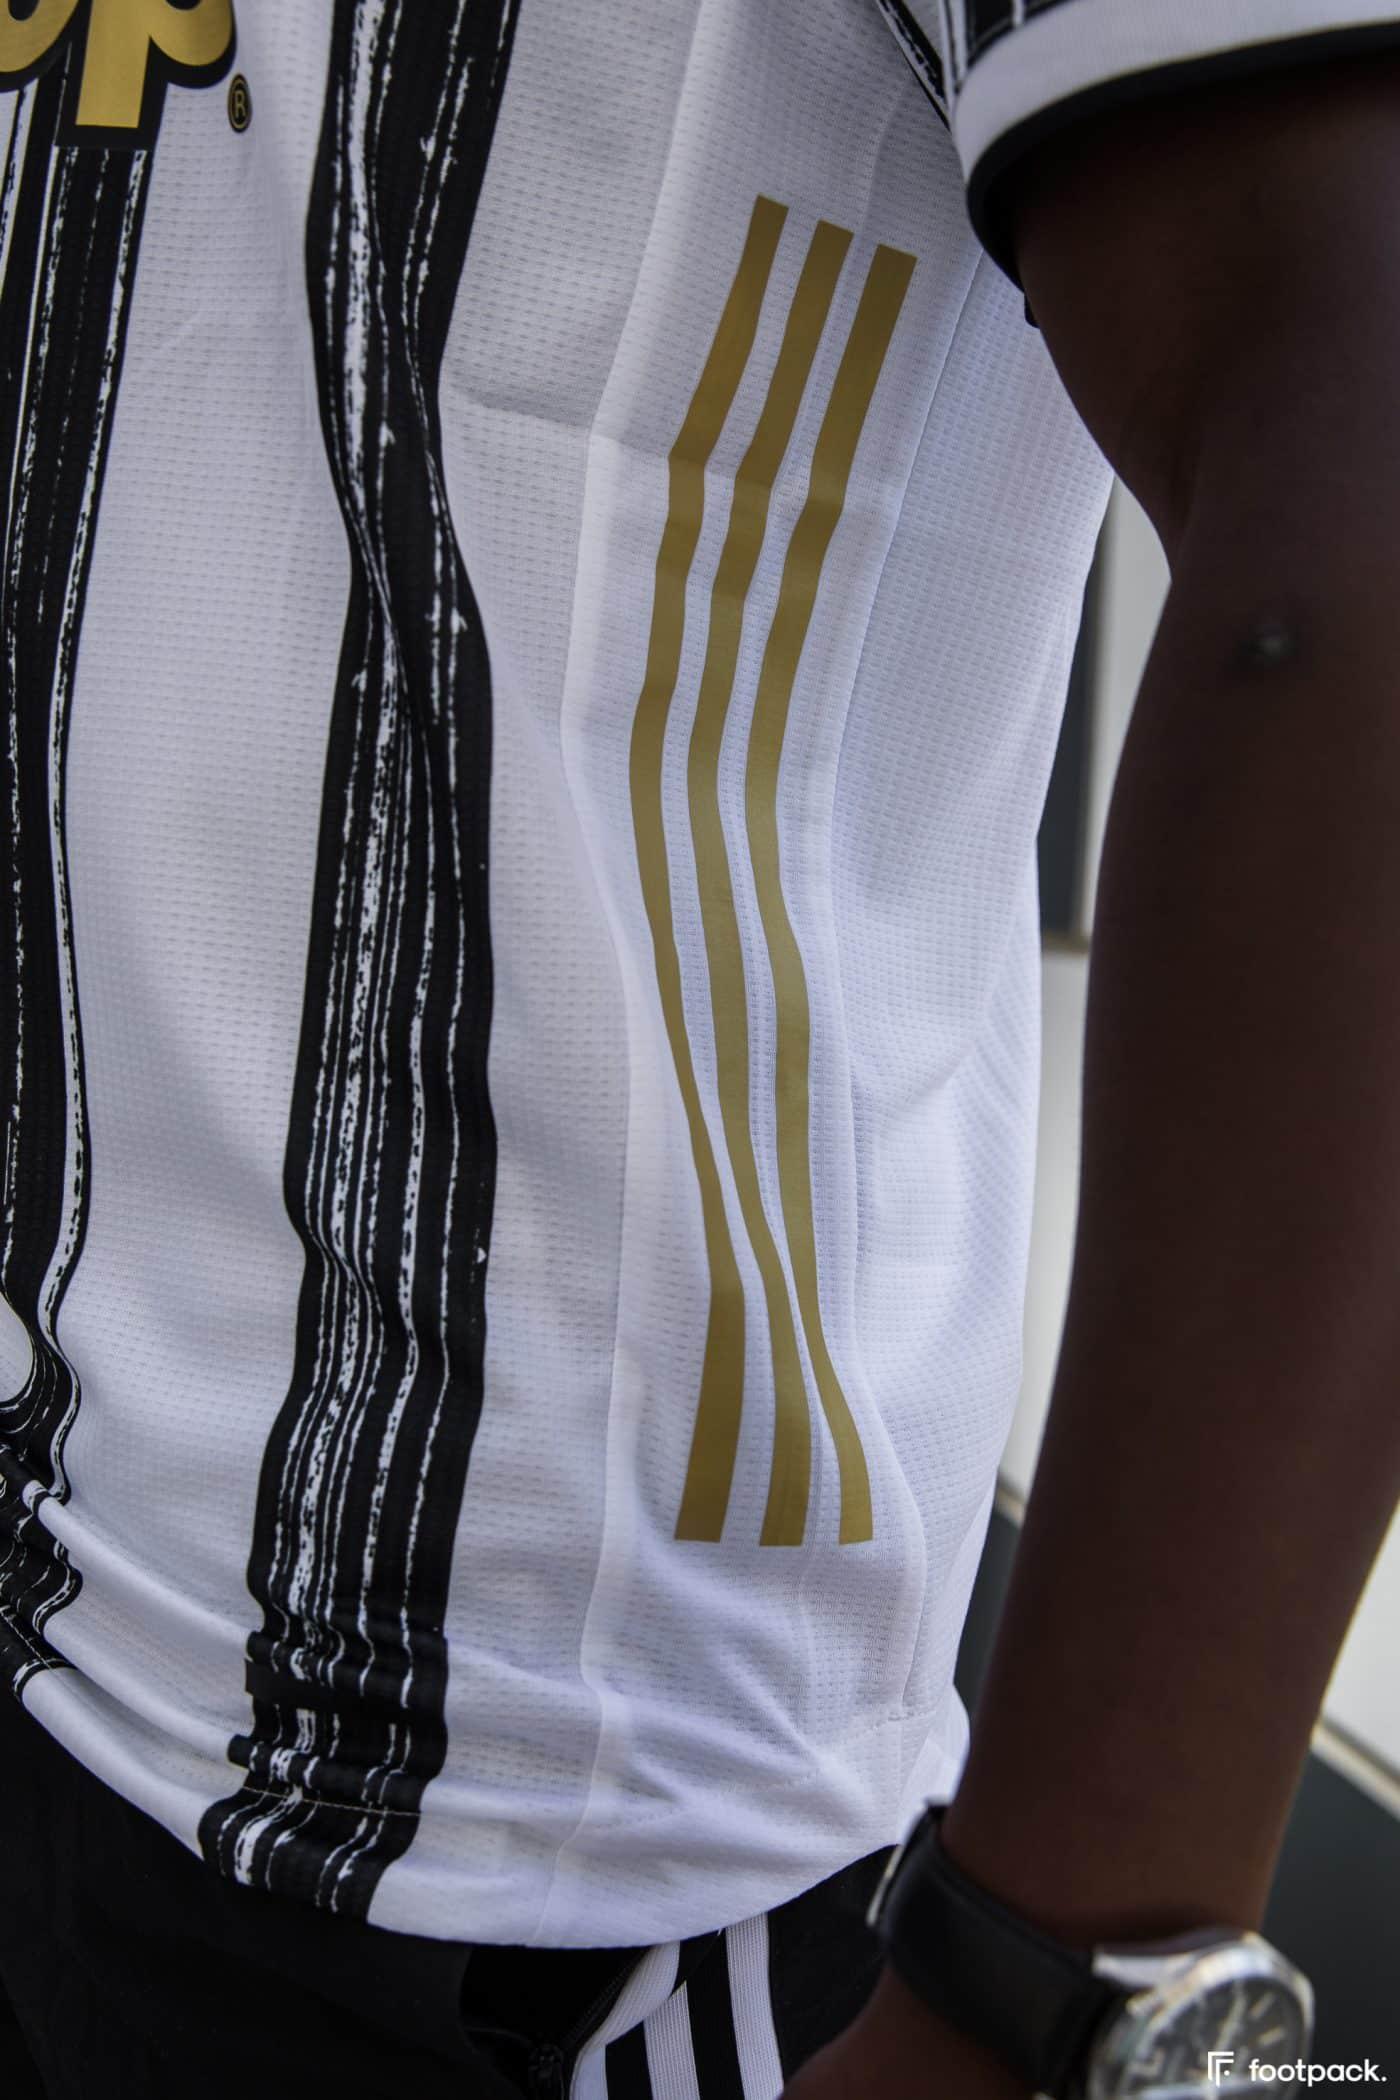 maillot-domicile-juventus-2020-2021-adidas-footpack-16